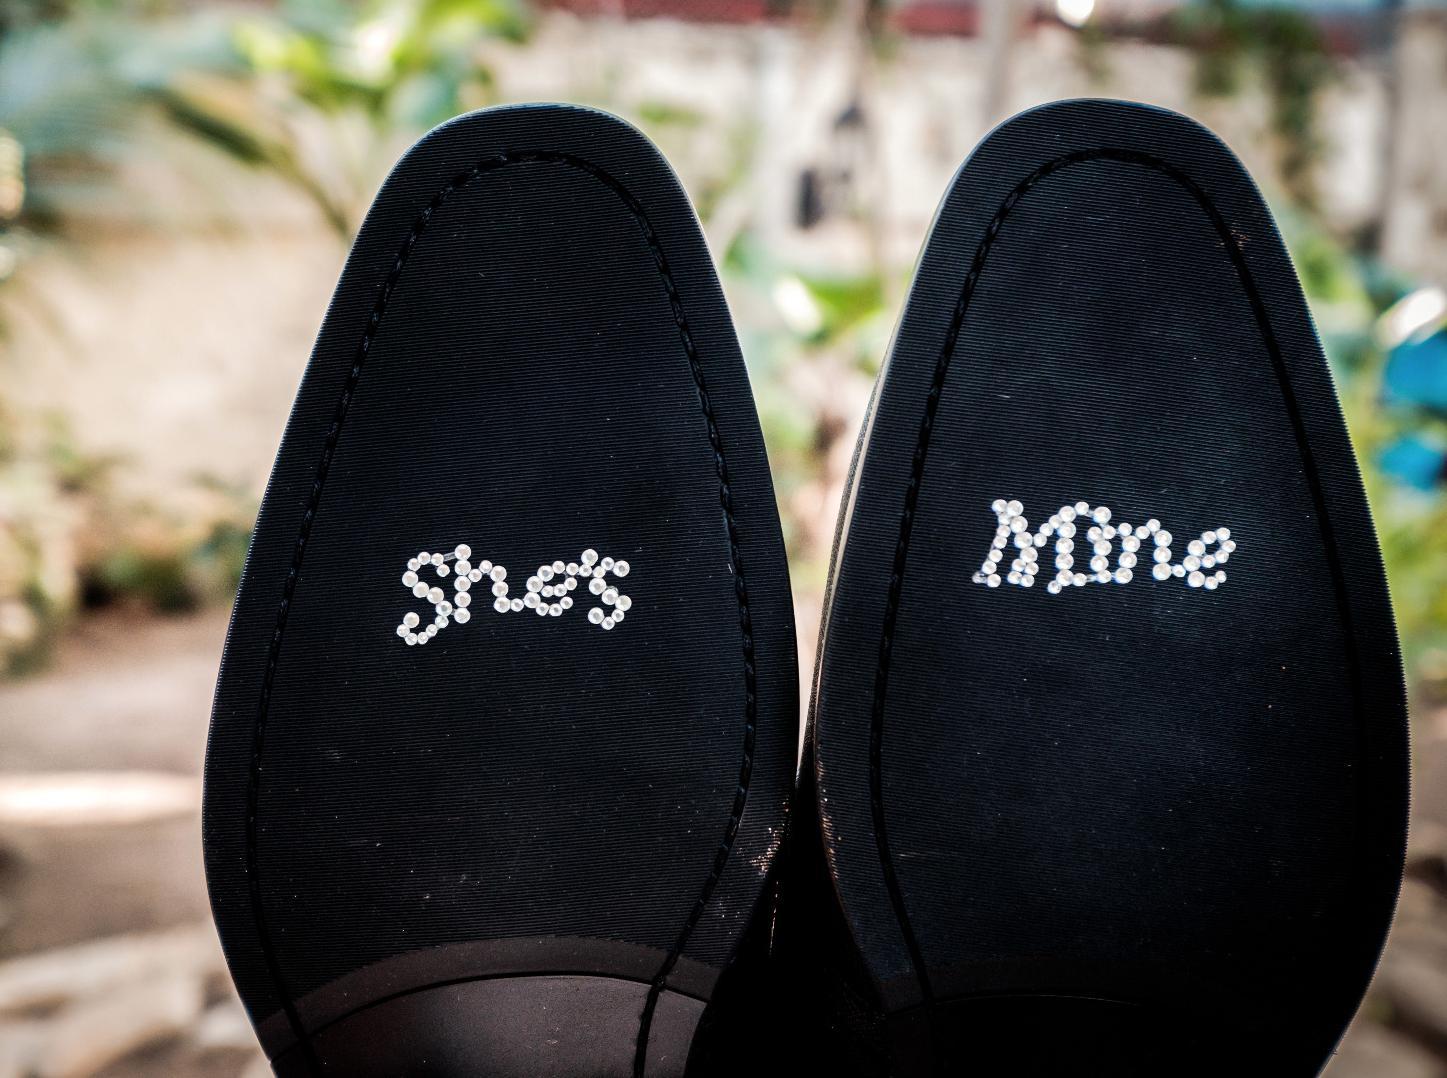 bodas-sin-clasificar-sin-tema-cuba-28091.jpg